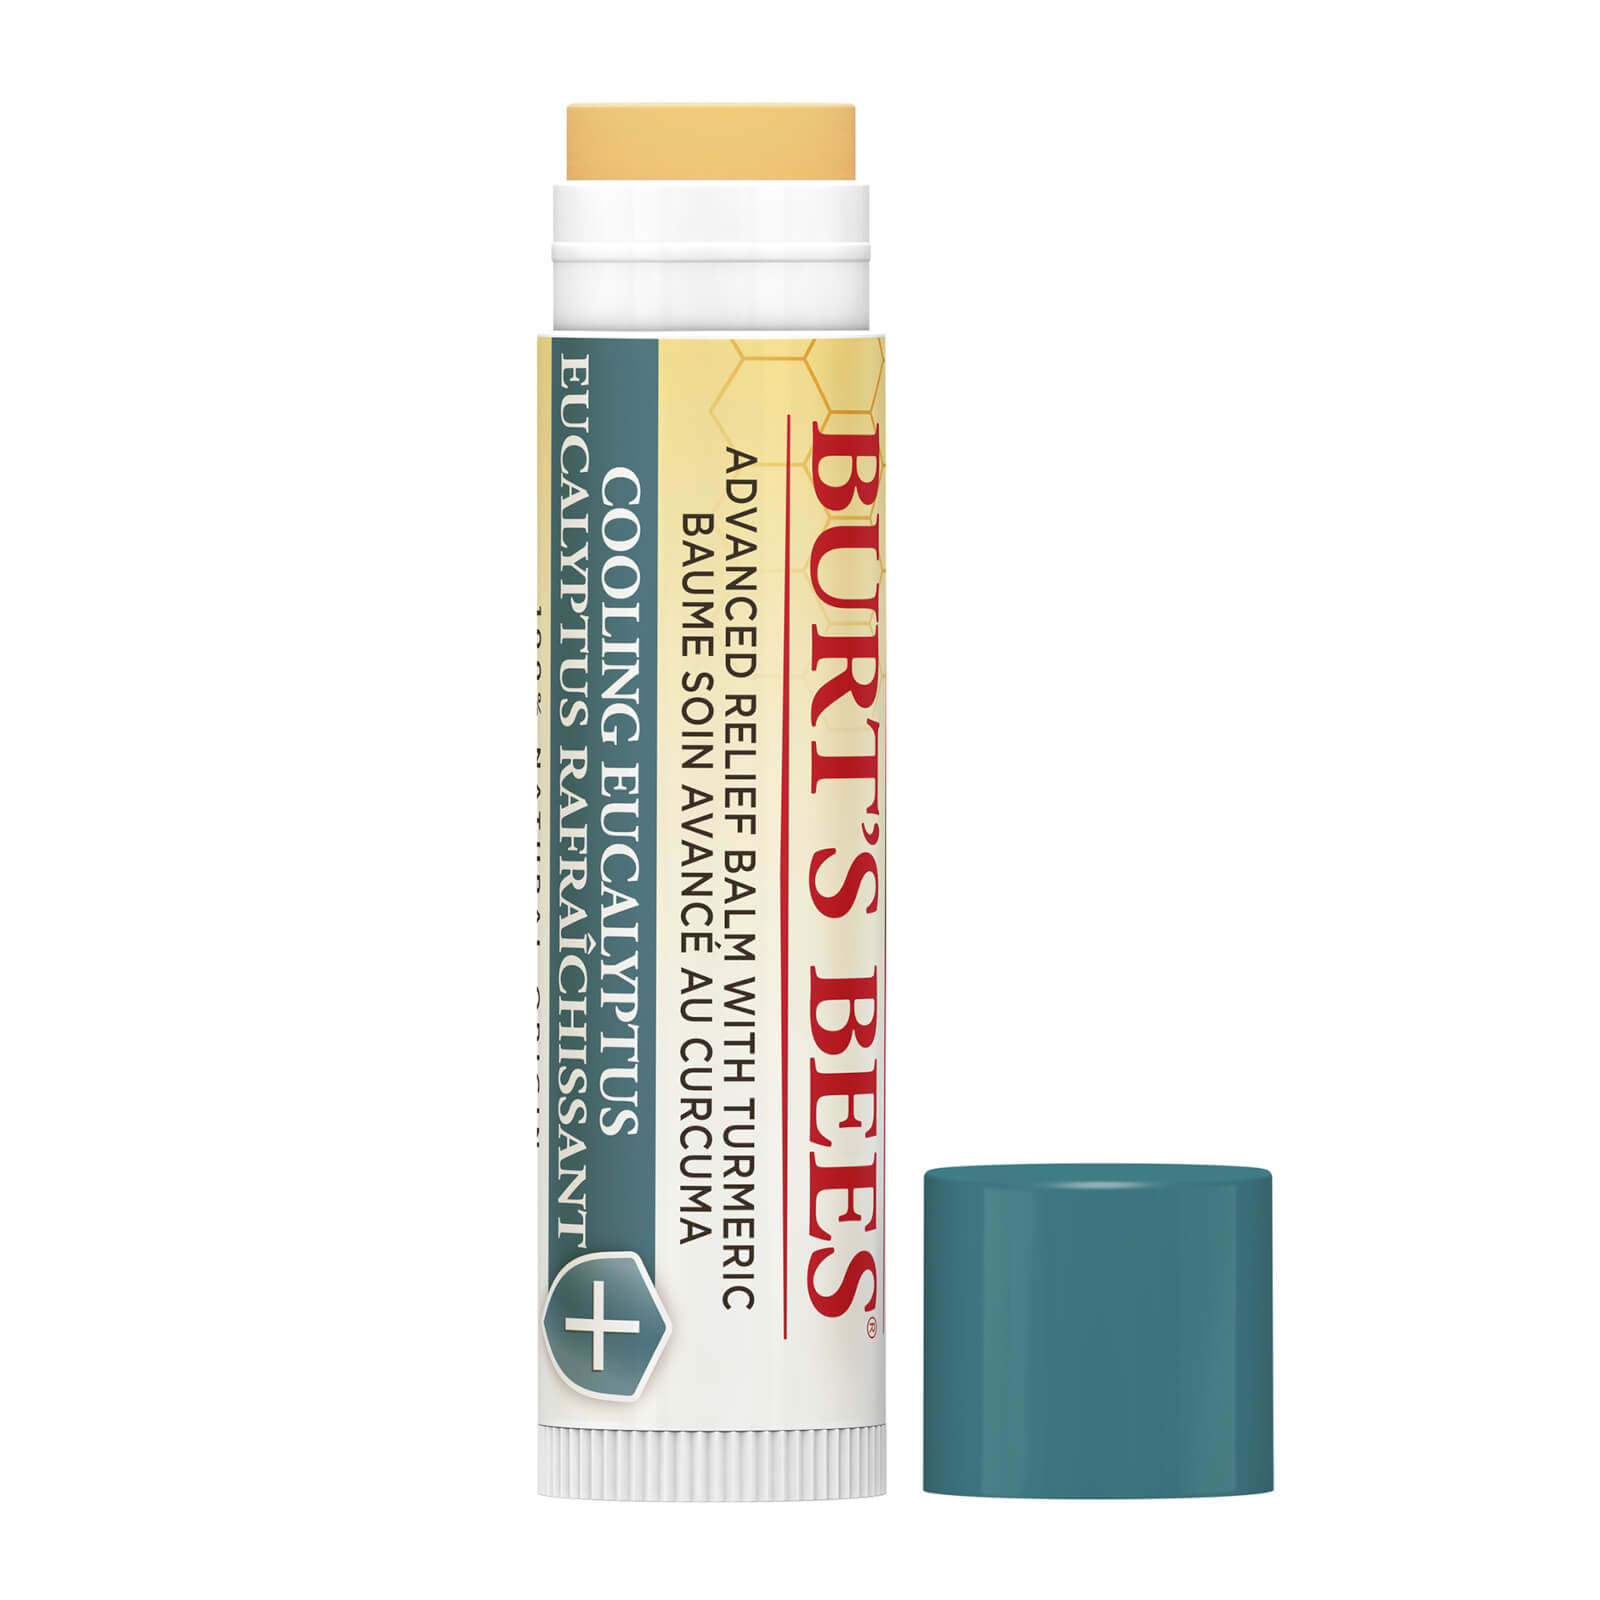 Купить Burt's Bees 100% Natural Origin Advanced Relief Lip Balm For Extremely Dry Lips, Cooling Eucalyptus